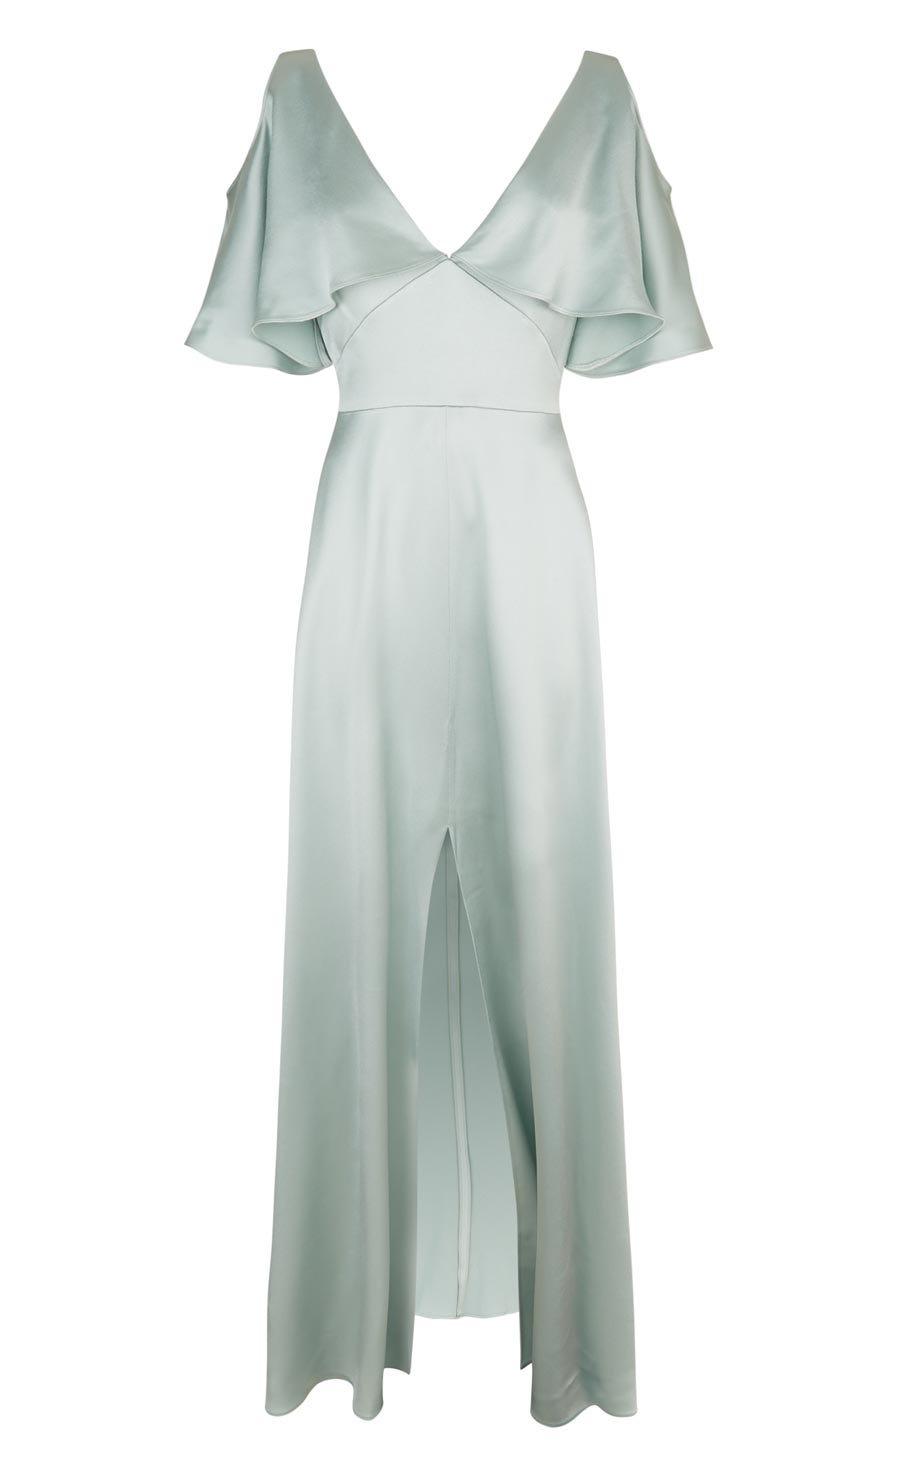 Rising Sleeved Dress, Pale Lichen